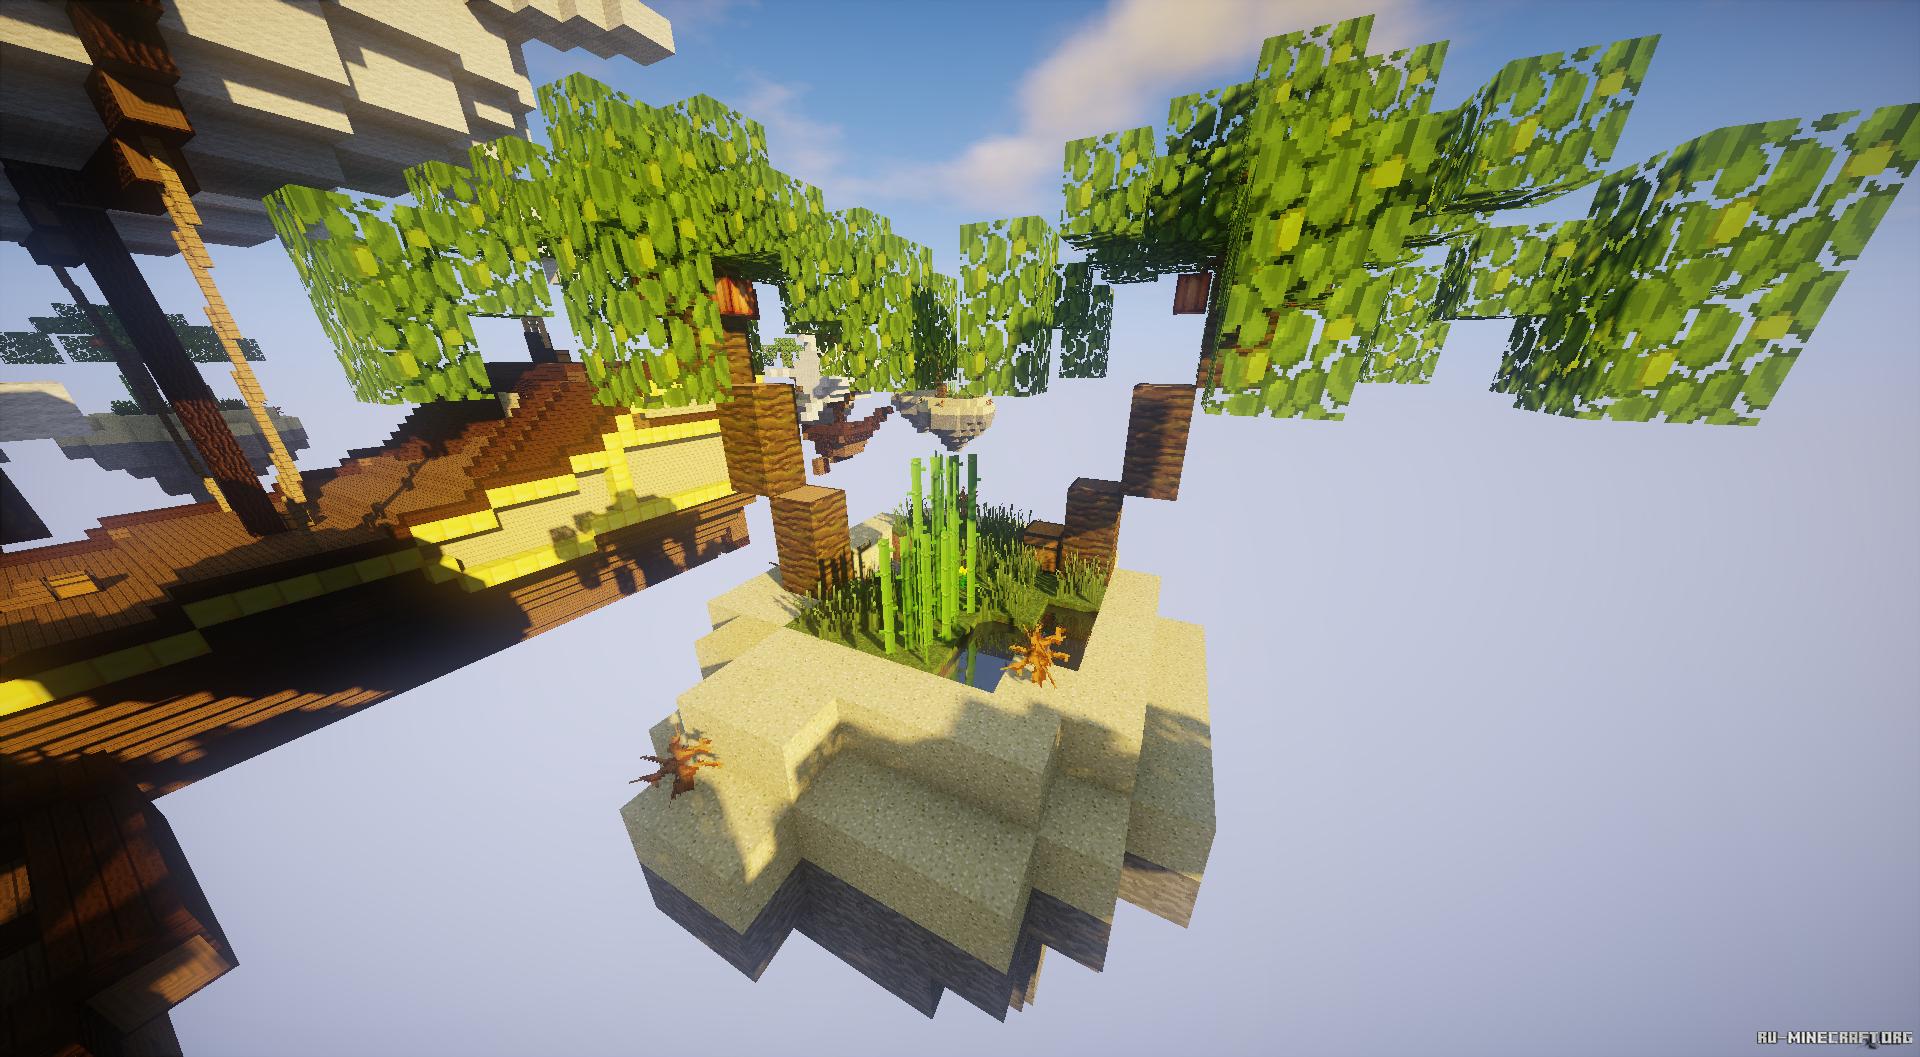 Lobby Зал Ожидания/Лобби для BedWars в Minecraft